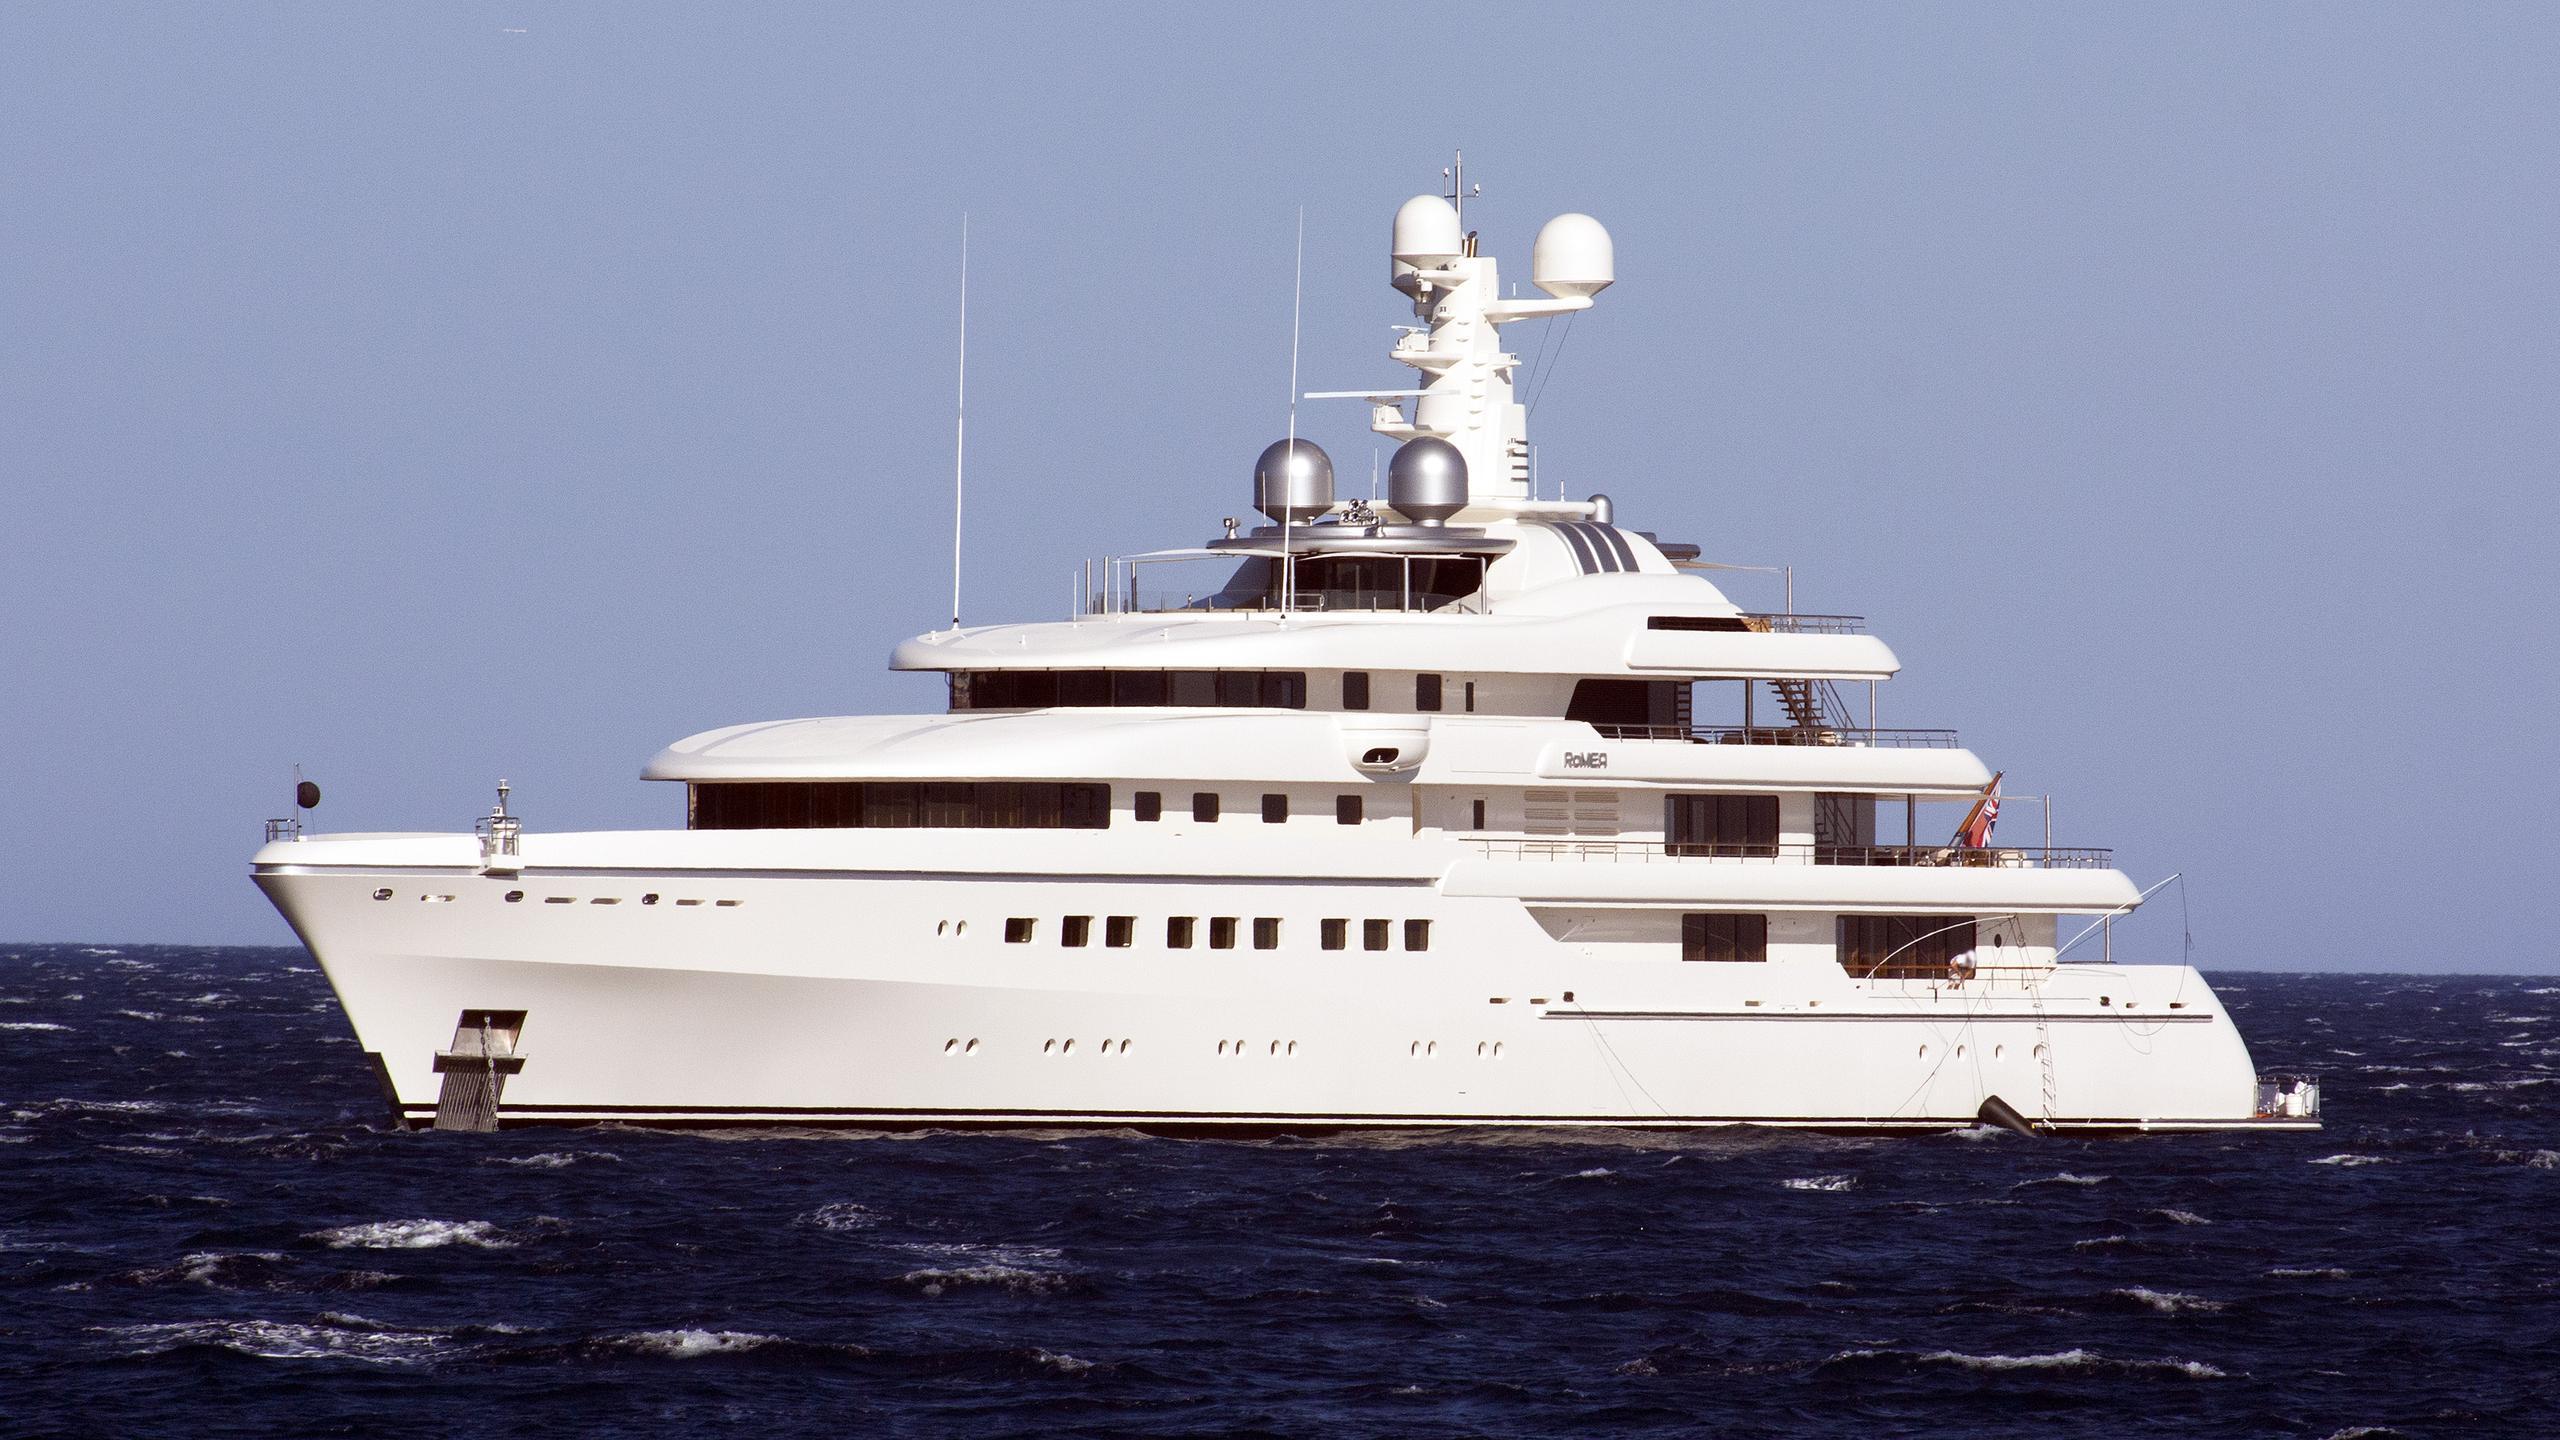 romea-motor-yacht-abeking-rasmussen-2015-82m-profile